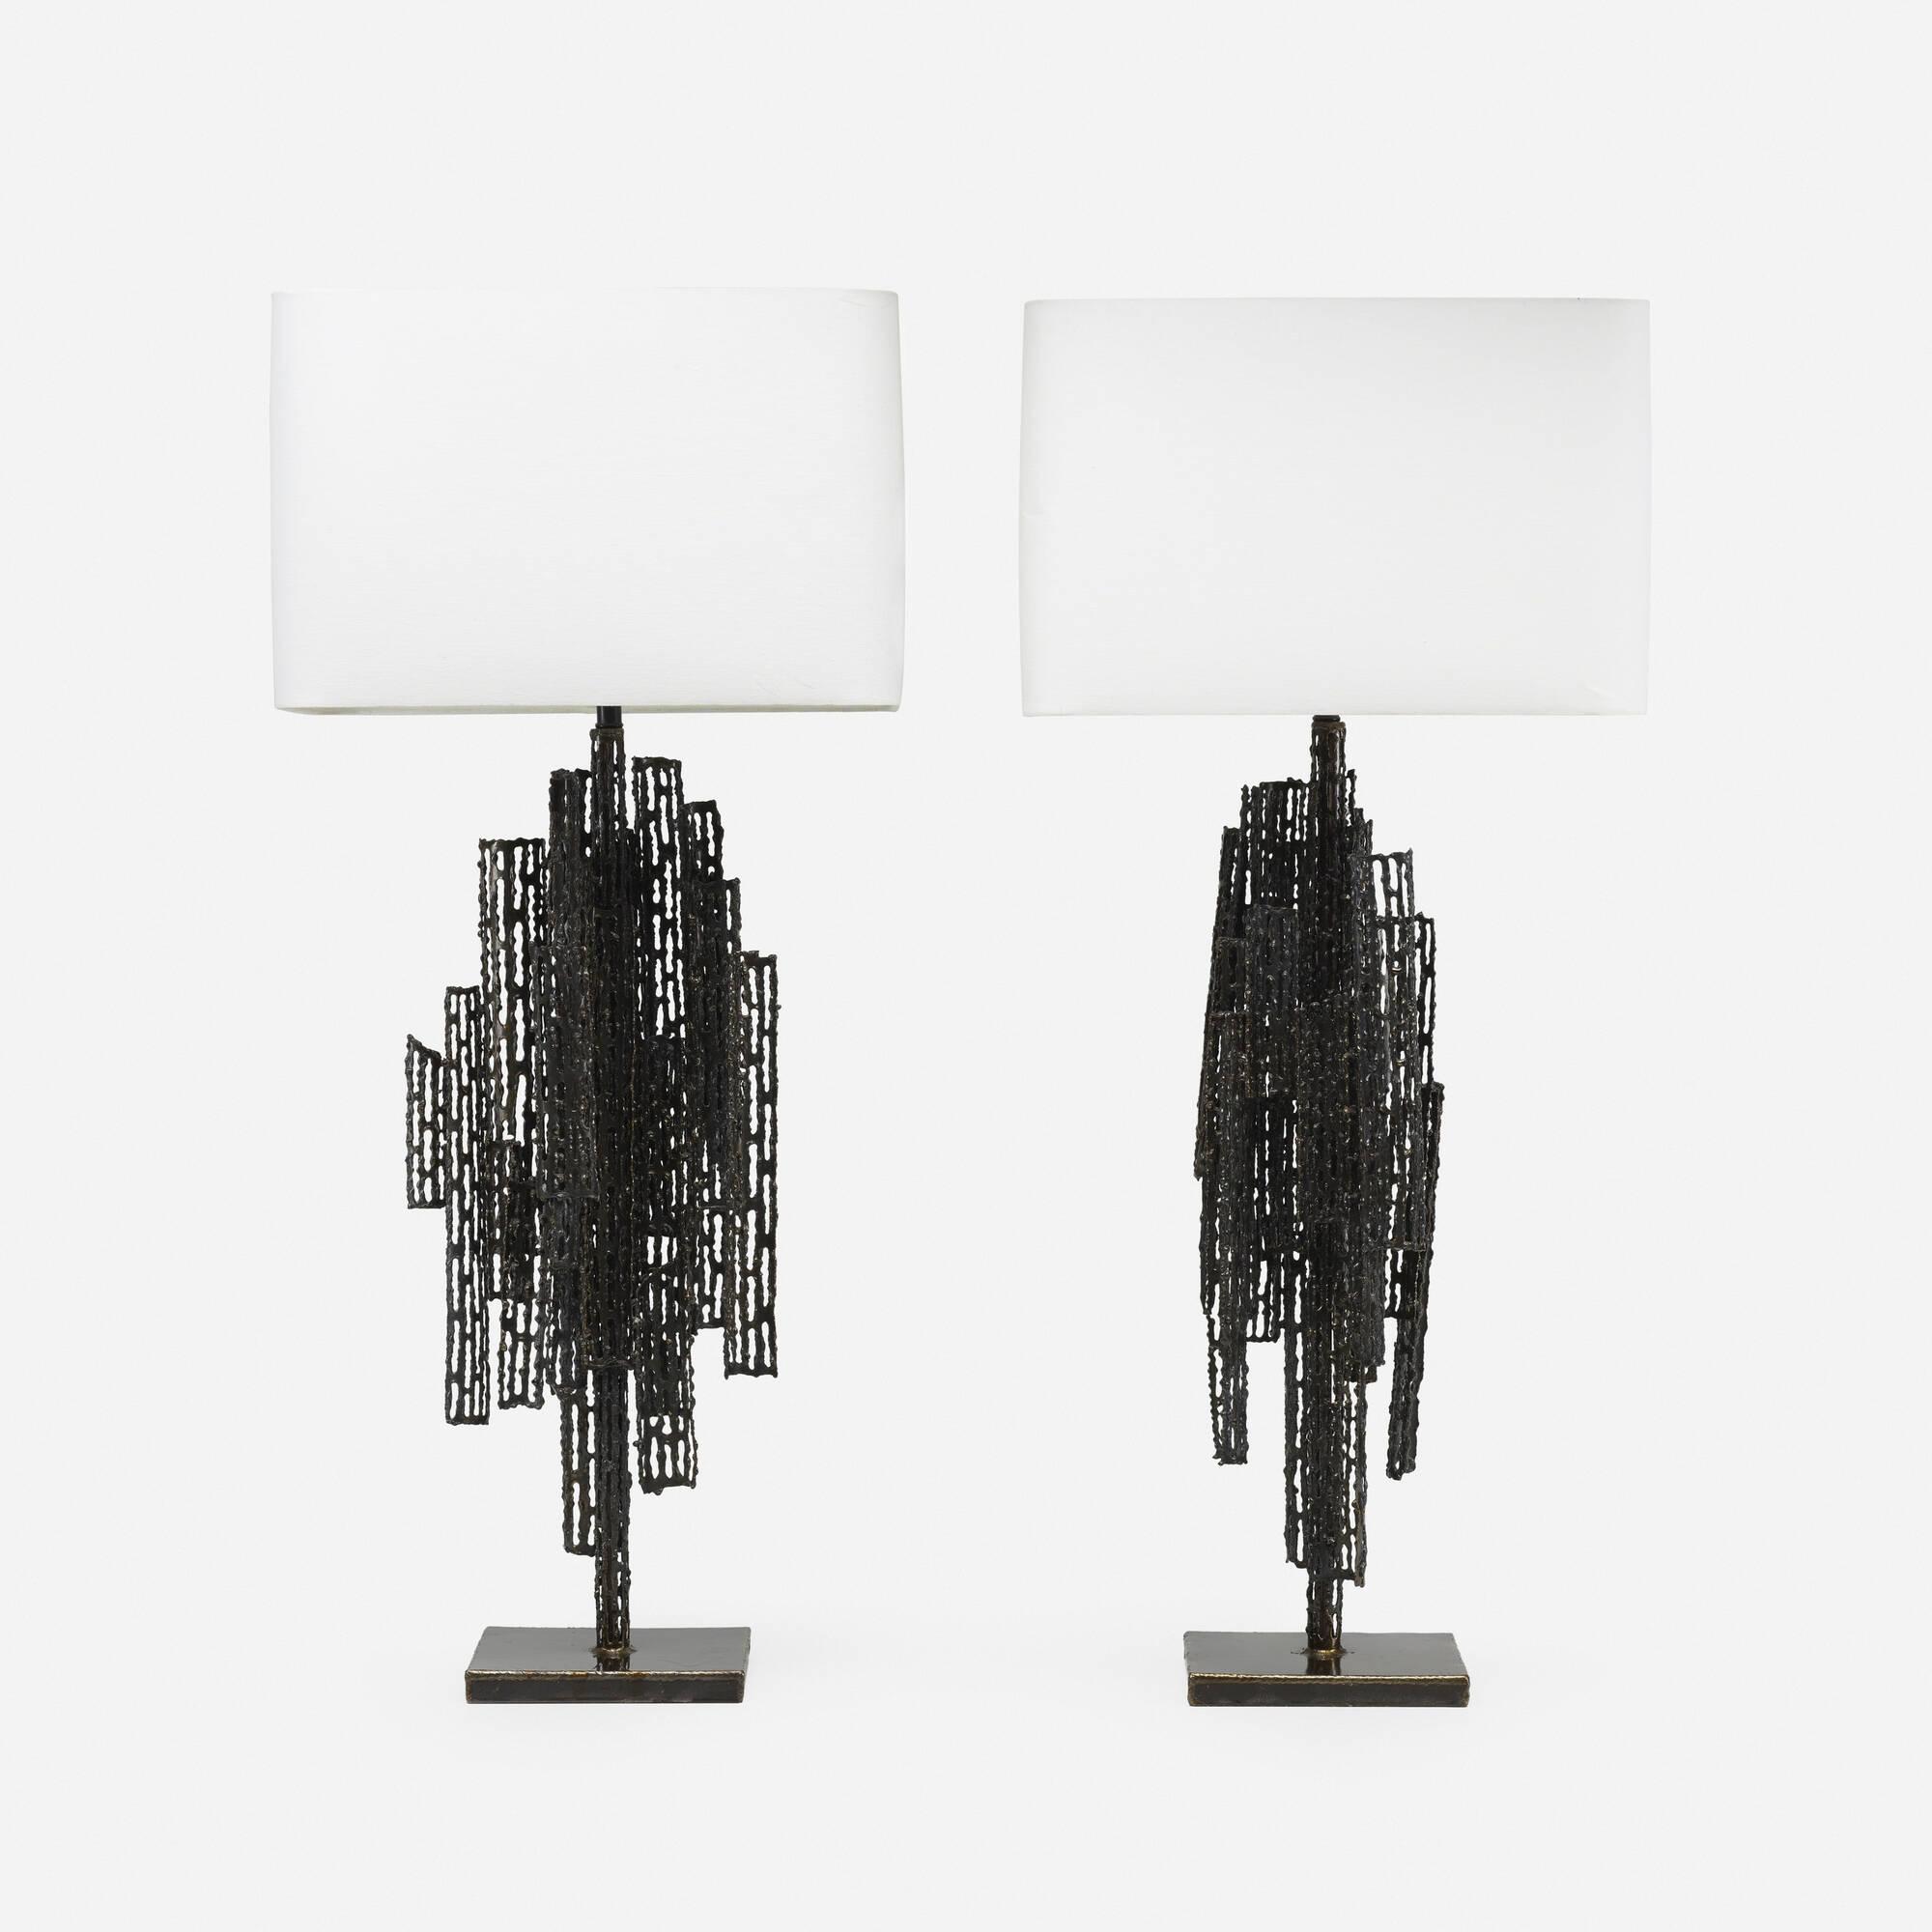 114: Marcello Fantoni / table lamps, pair (1 of 2)